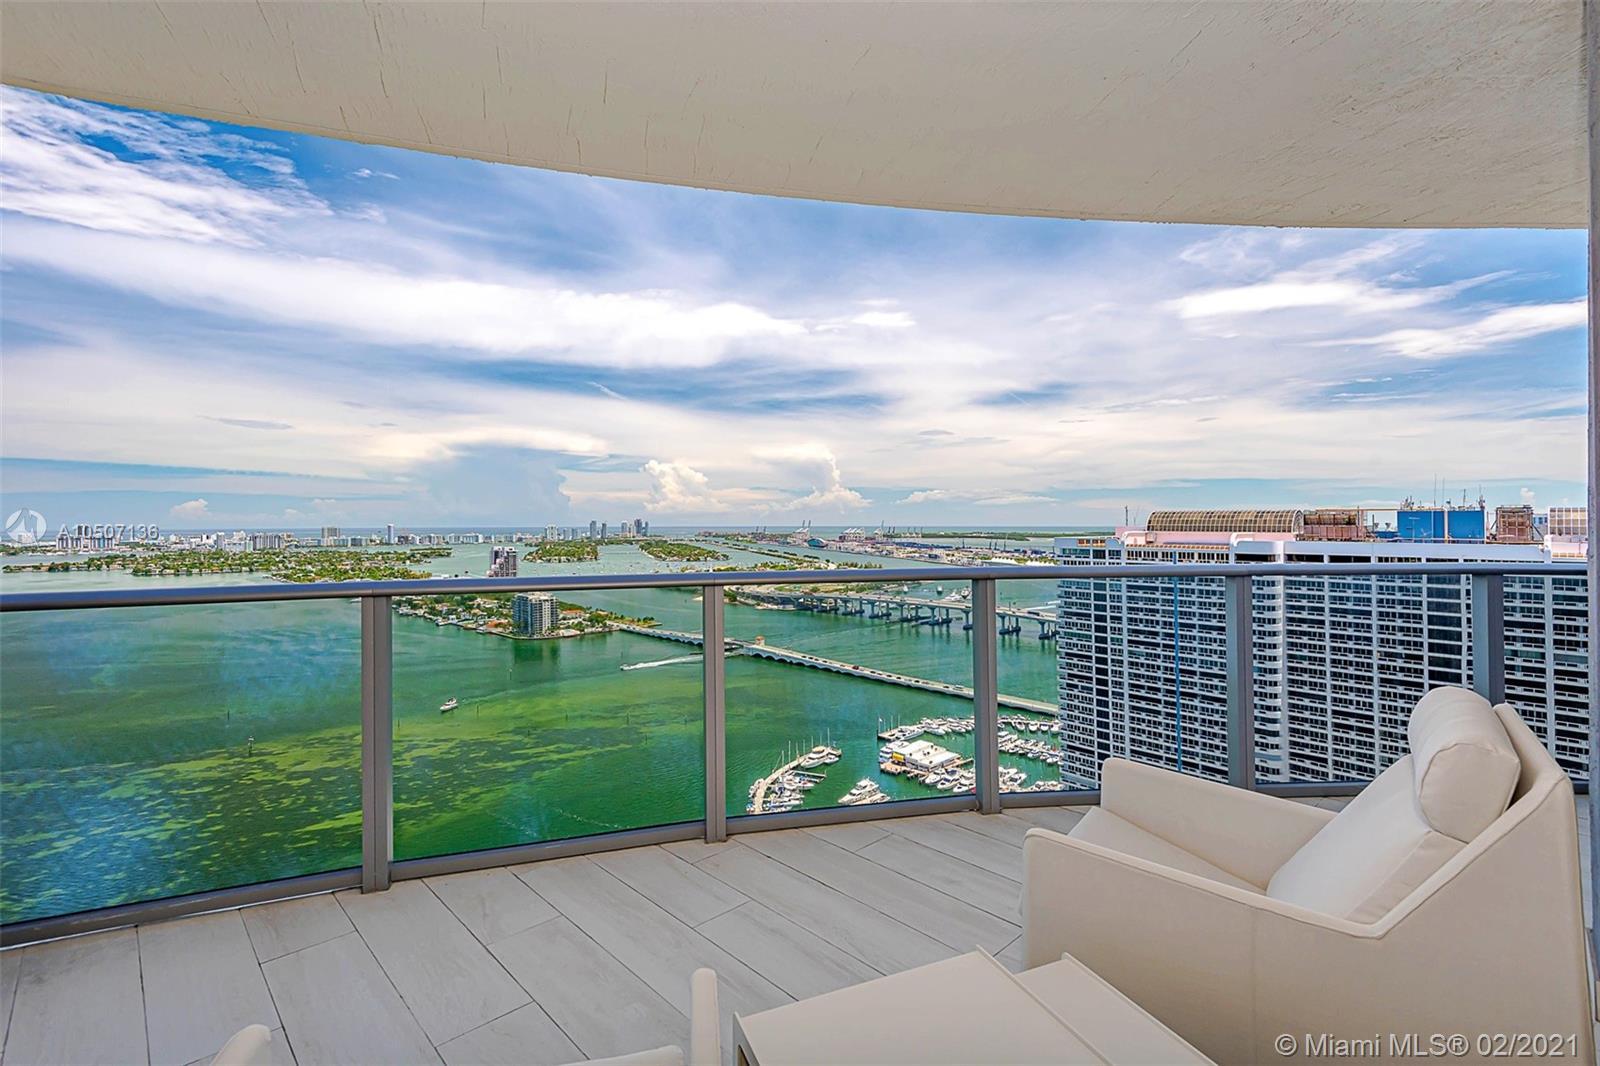 488 NE 18th Street # 3812, Miami, Florida 33132, 3 Bedrooms Bedrooms, ,4 BathroomsBathrooms,Residential,For Sale,488 NE 18th Street # 3812,A10507136